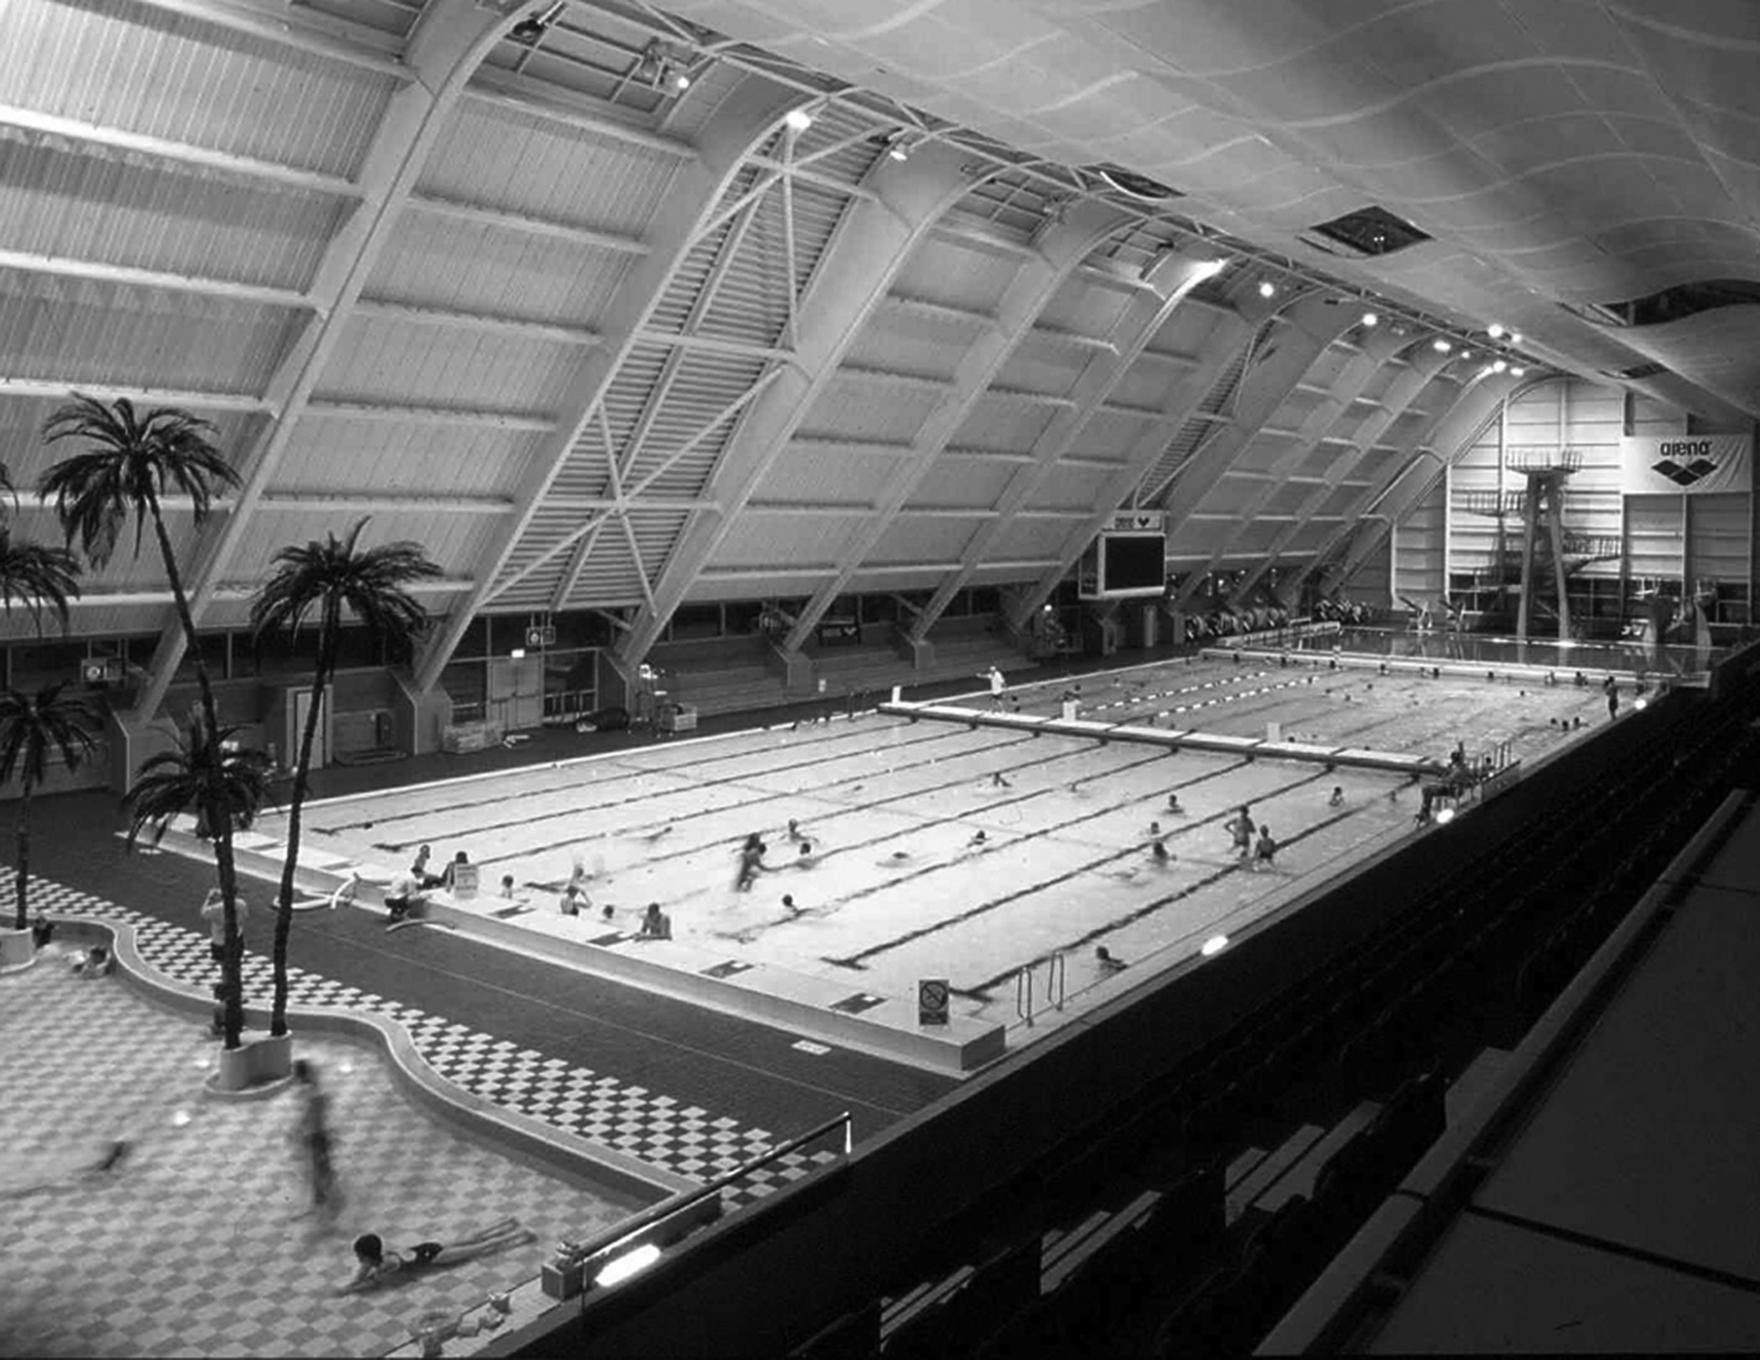 50M Pool Design Expertise Manchester Aquatics Centre Leisure Water L